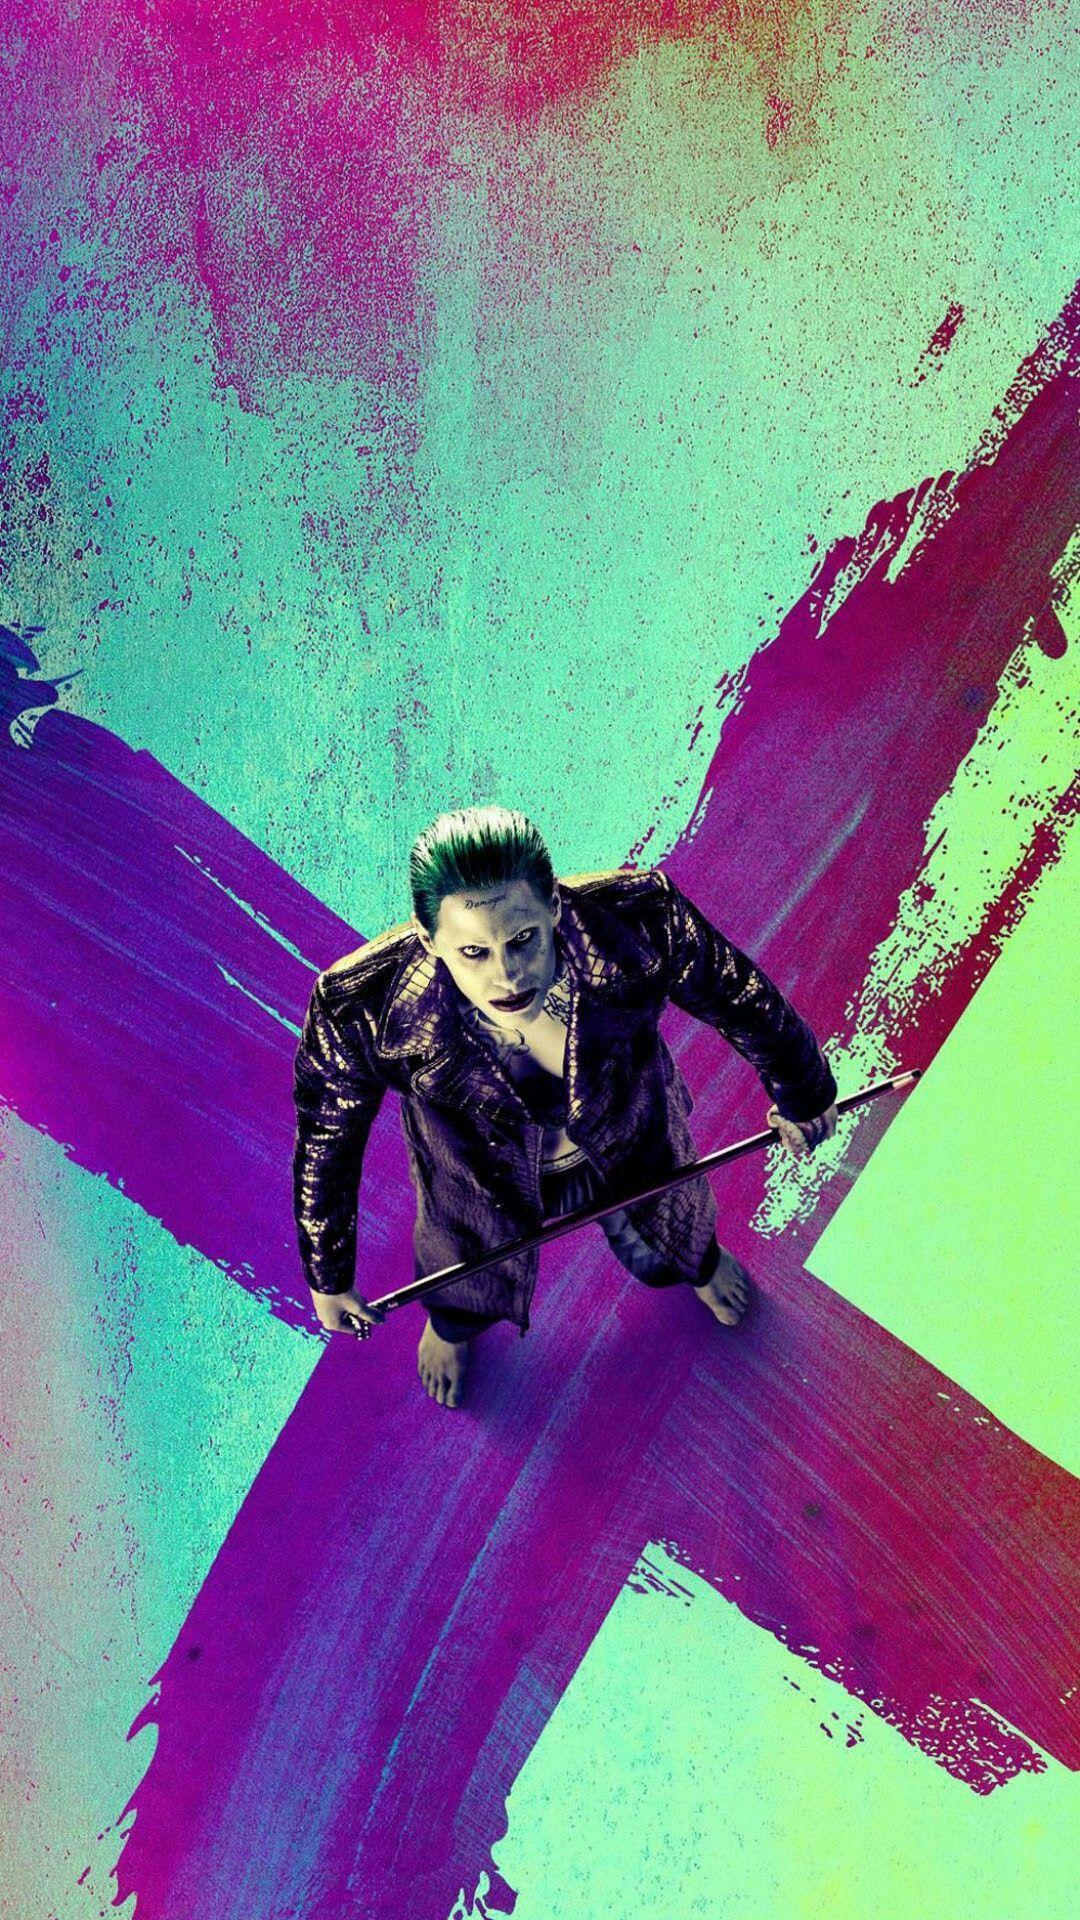 Joker Suicide Squad Jared Leto Batman Joker Wallpaper Joker